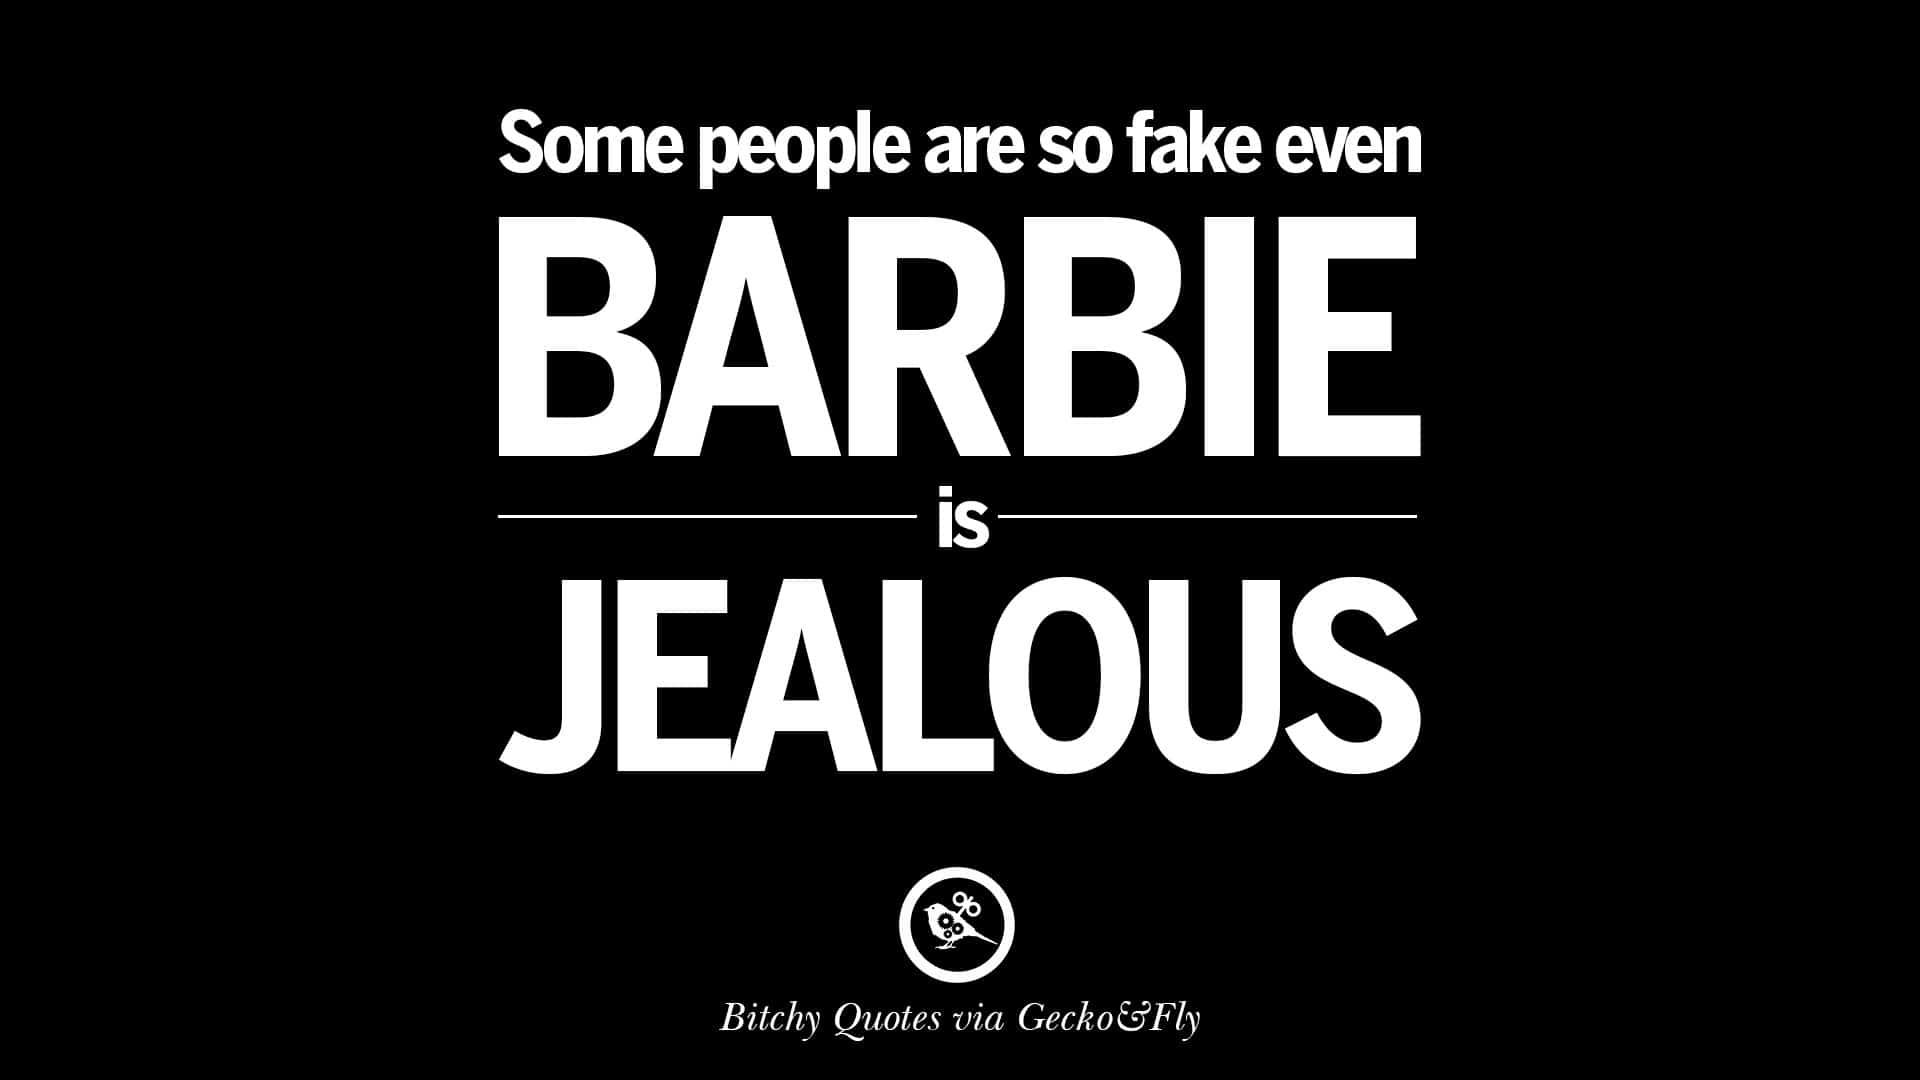 Barbie is jealous Fake people Meme